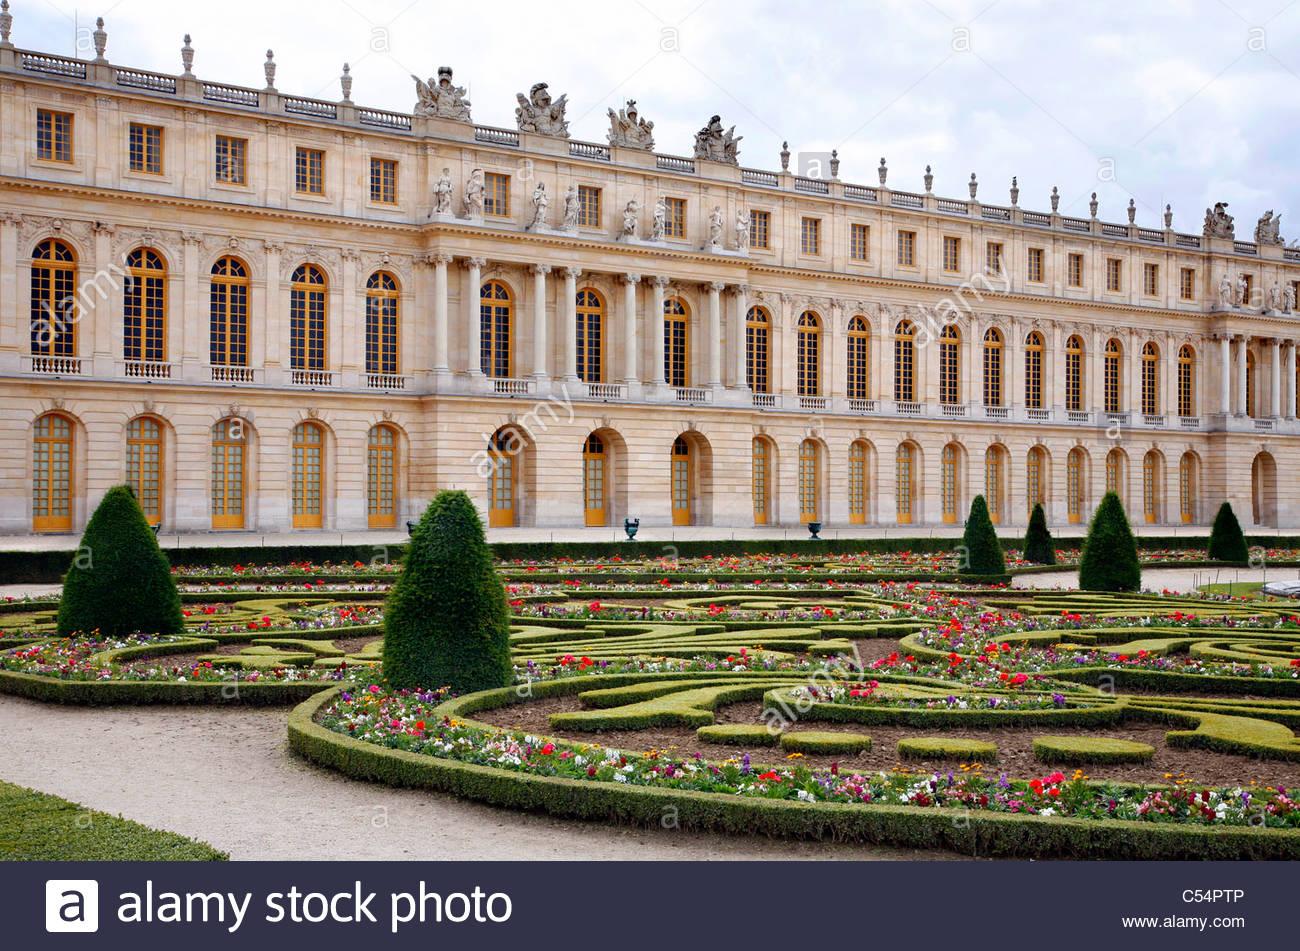 paris versailles palace C54PTP